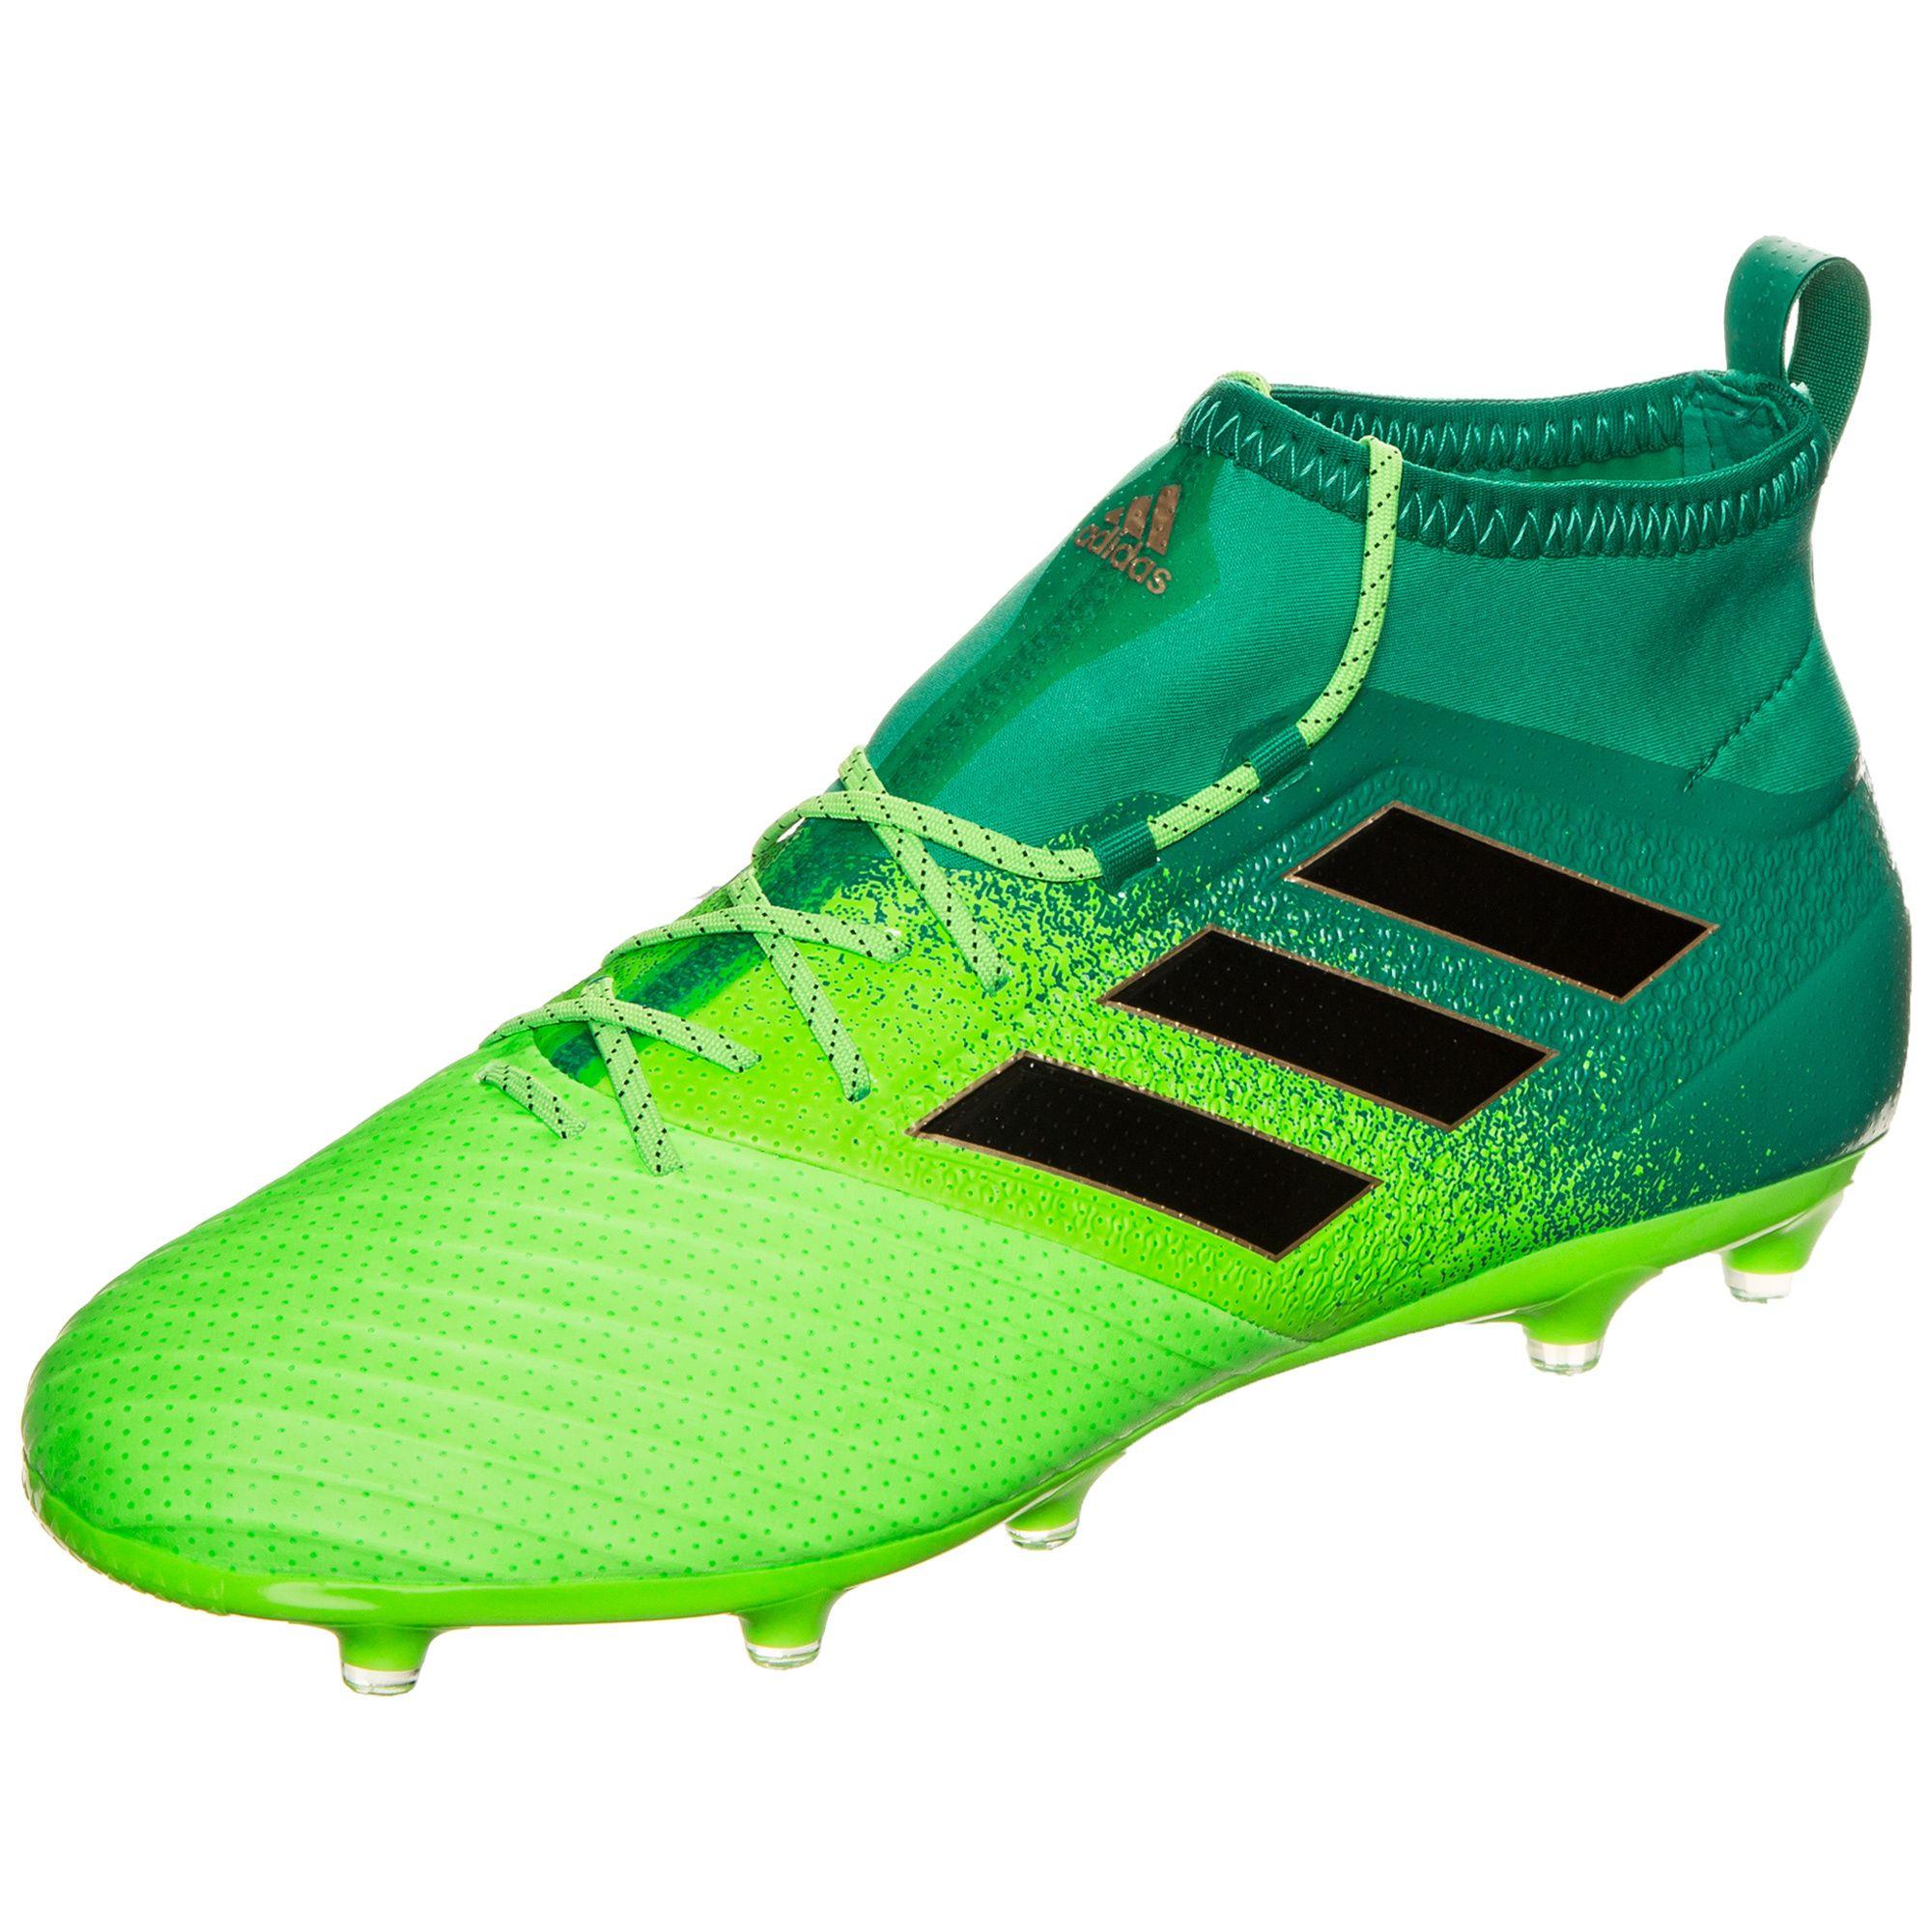 ADIDAS PERFORMANCE adidas Performance ACE 17.2 Primemesh FG Fußballschuh Herren